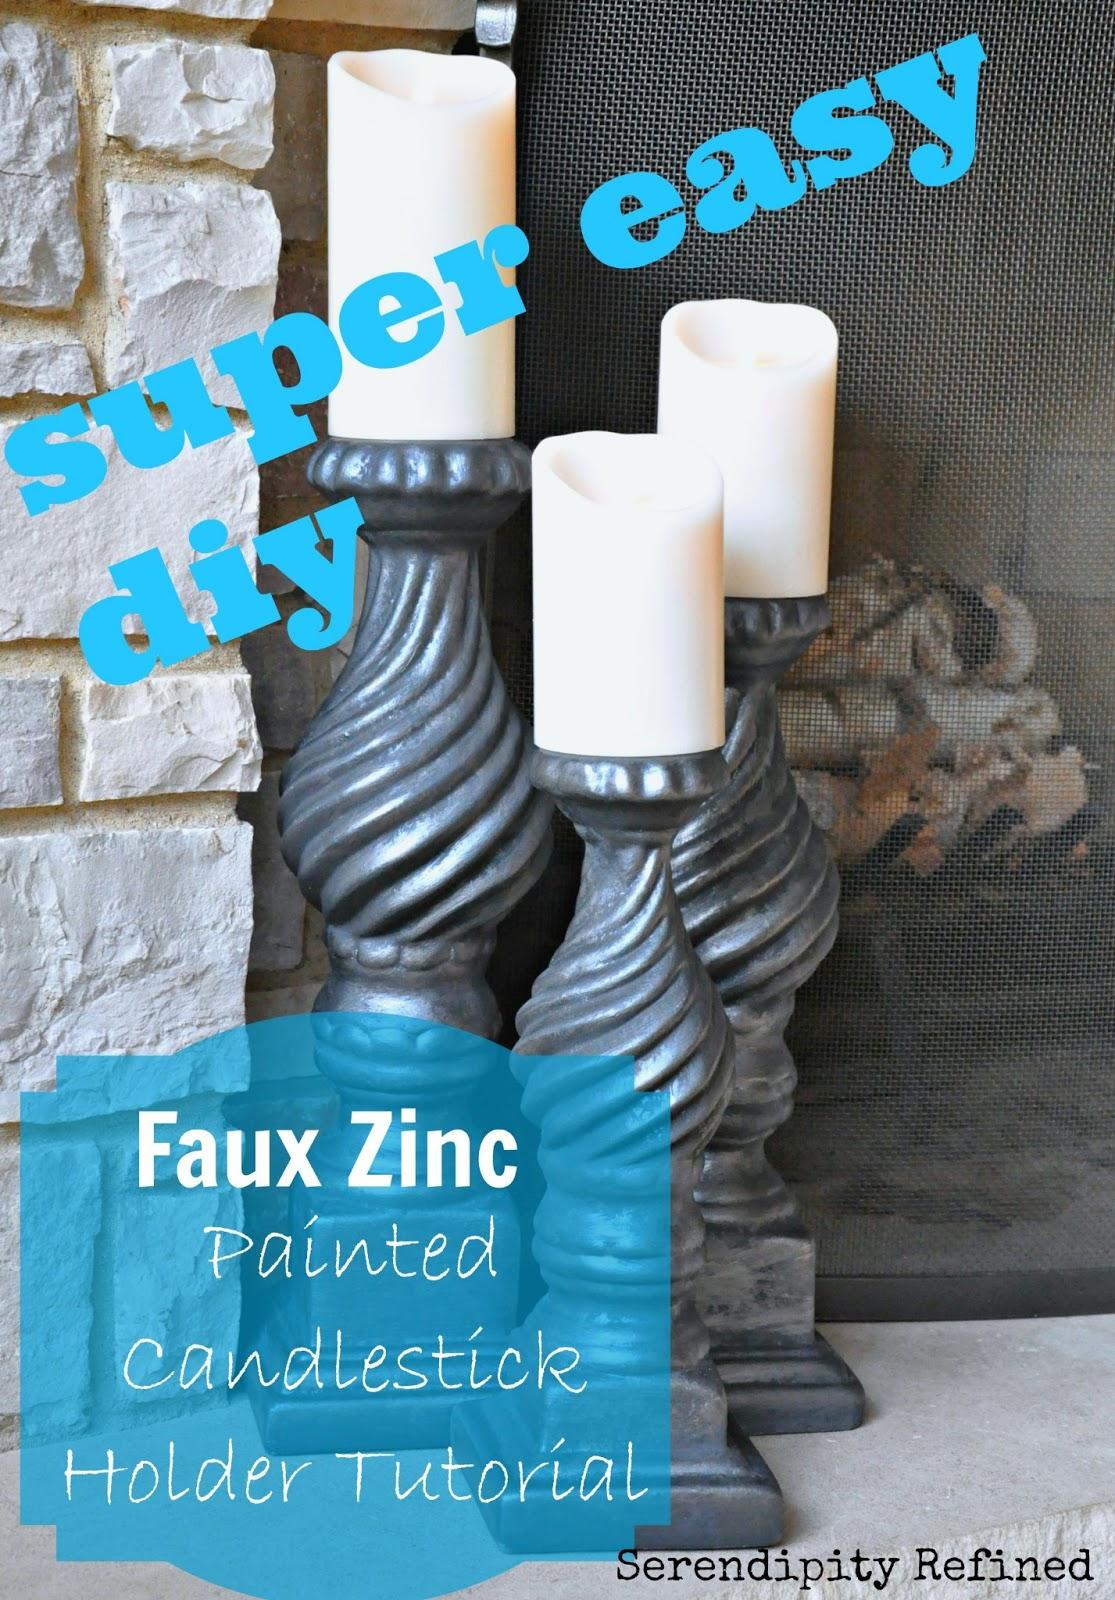 Super Easy Diy Dish Soap 3 Ingredients: Serendipity Refined Blog: EASY DIY: Super Simple Faux Zinc